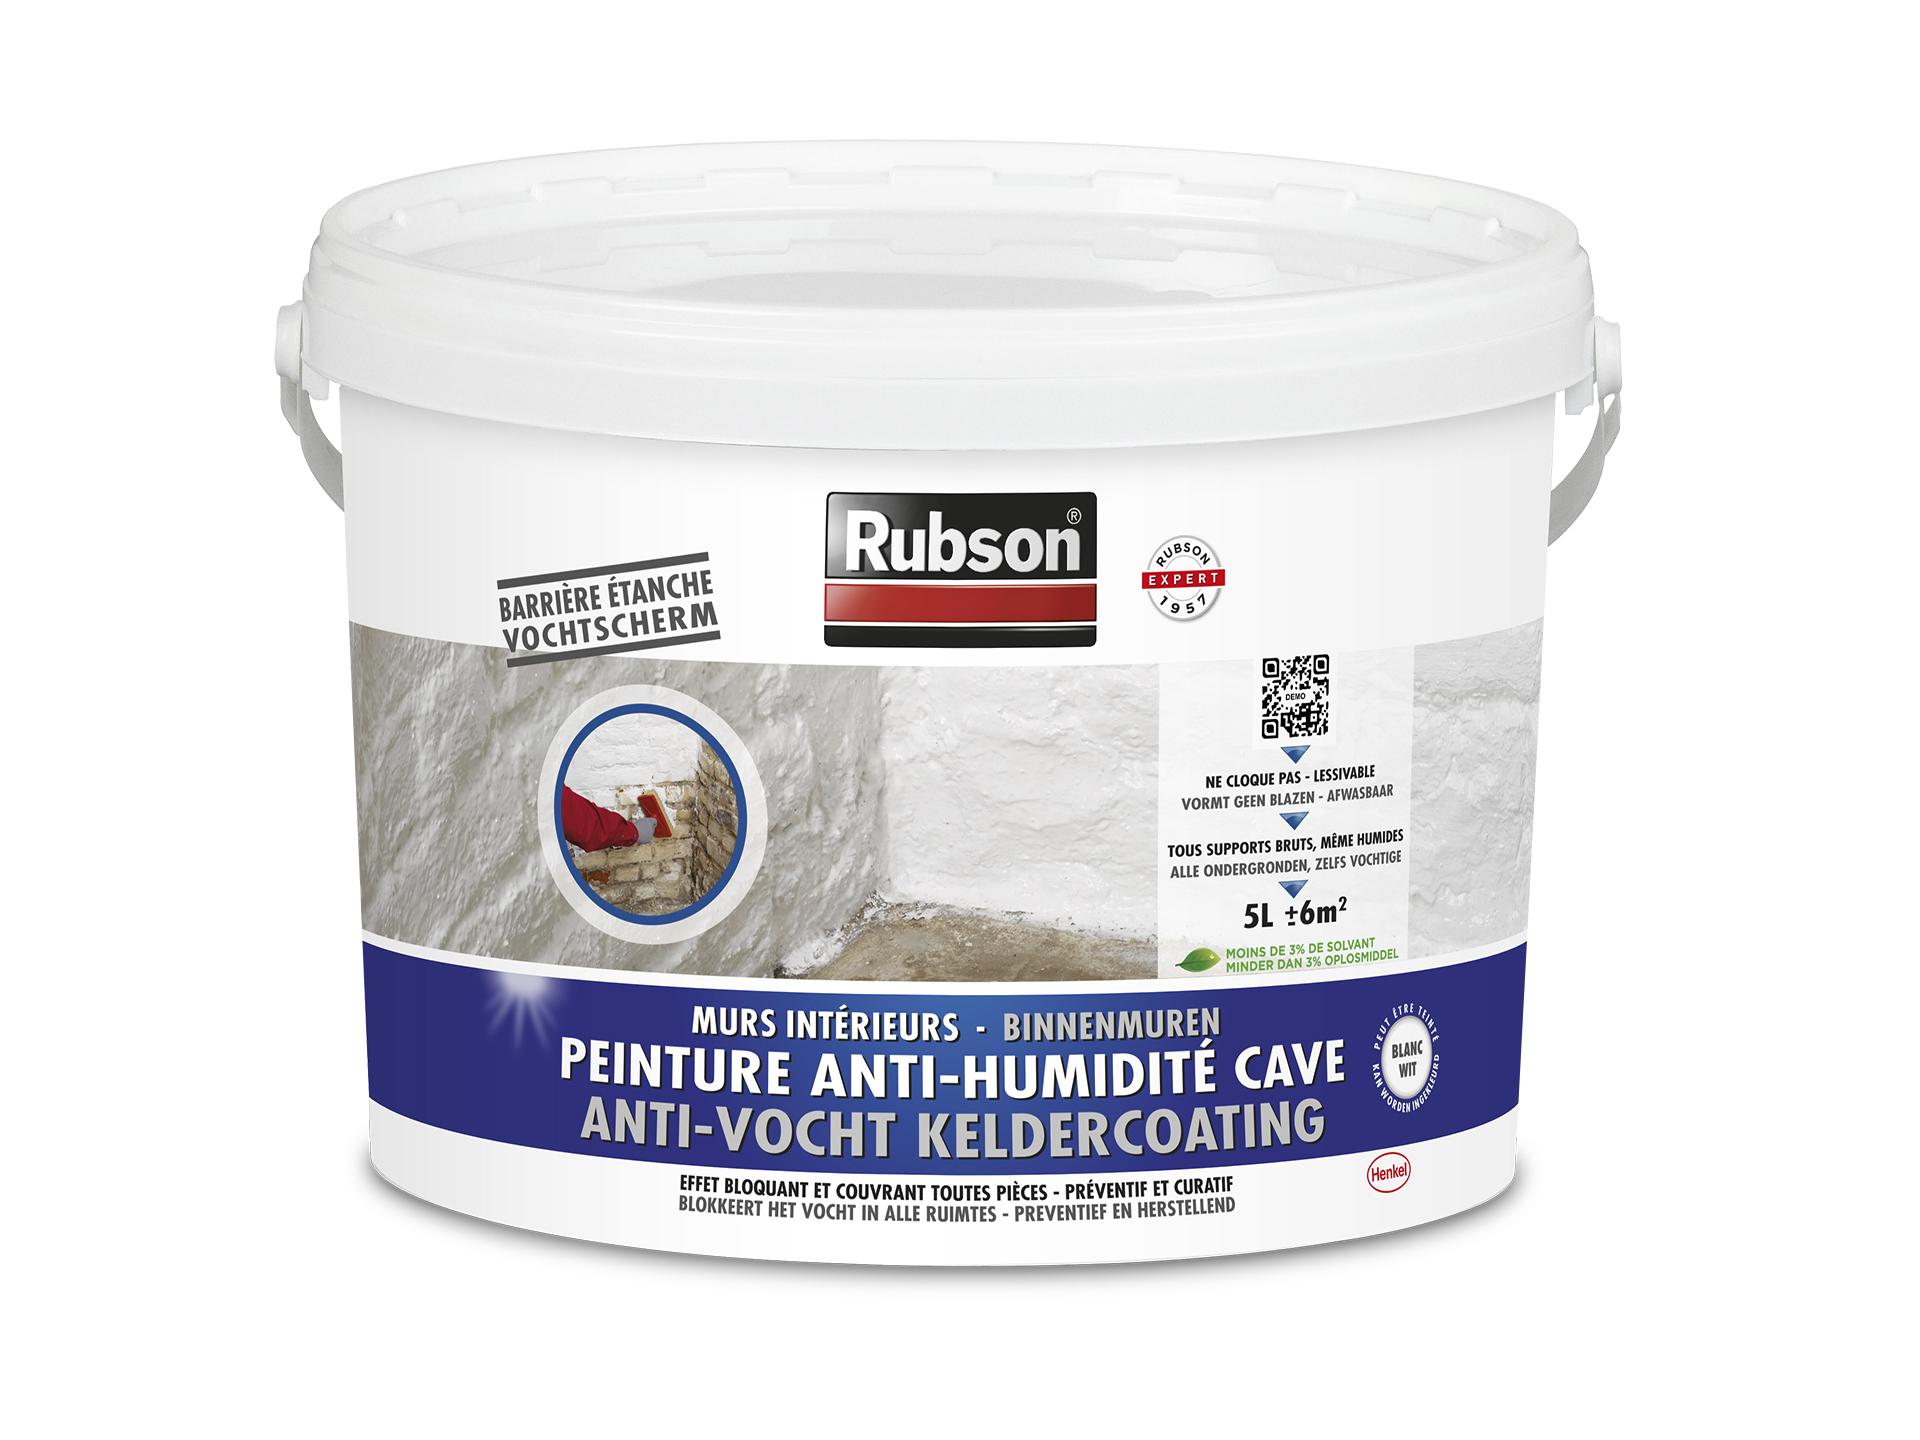 Rubson Peinture Anti Humidité Cave 5l